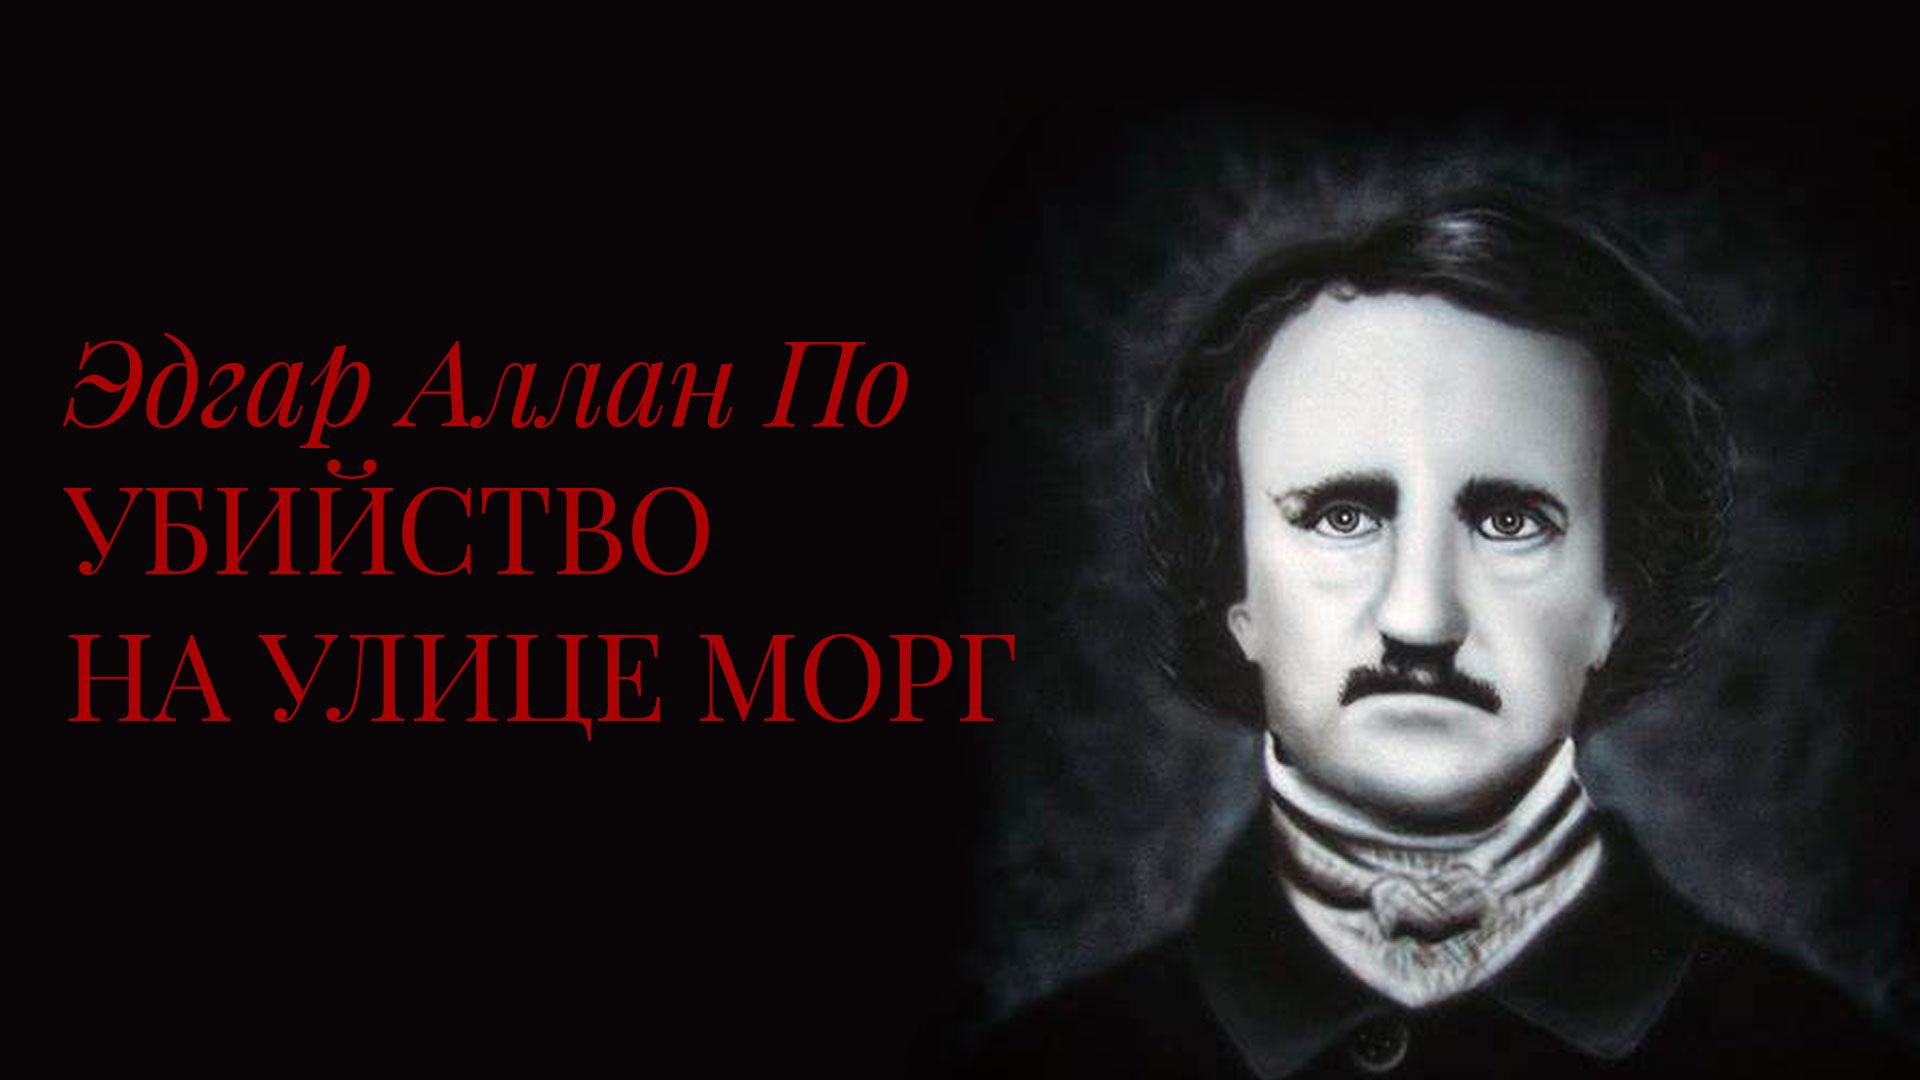 Эдгар Аллан По. Убийство на улице Морг